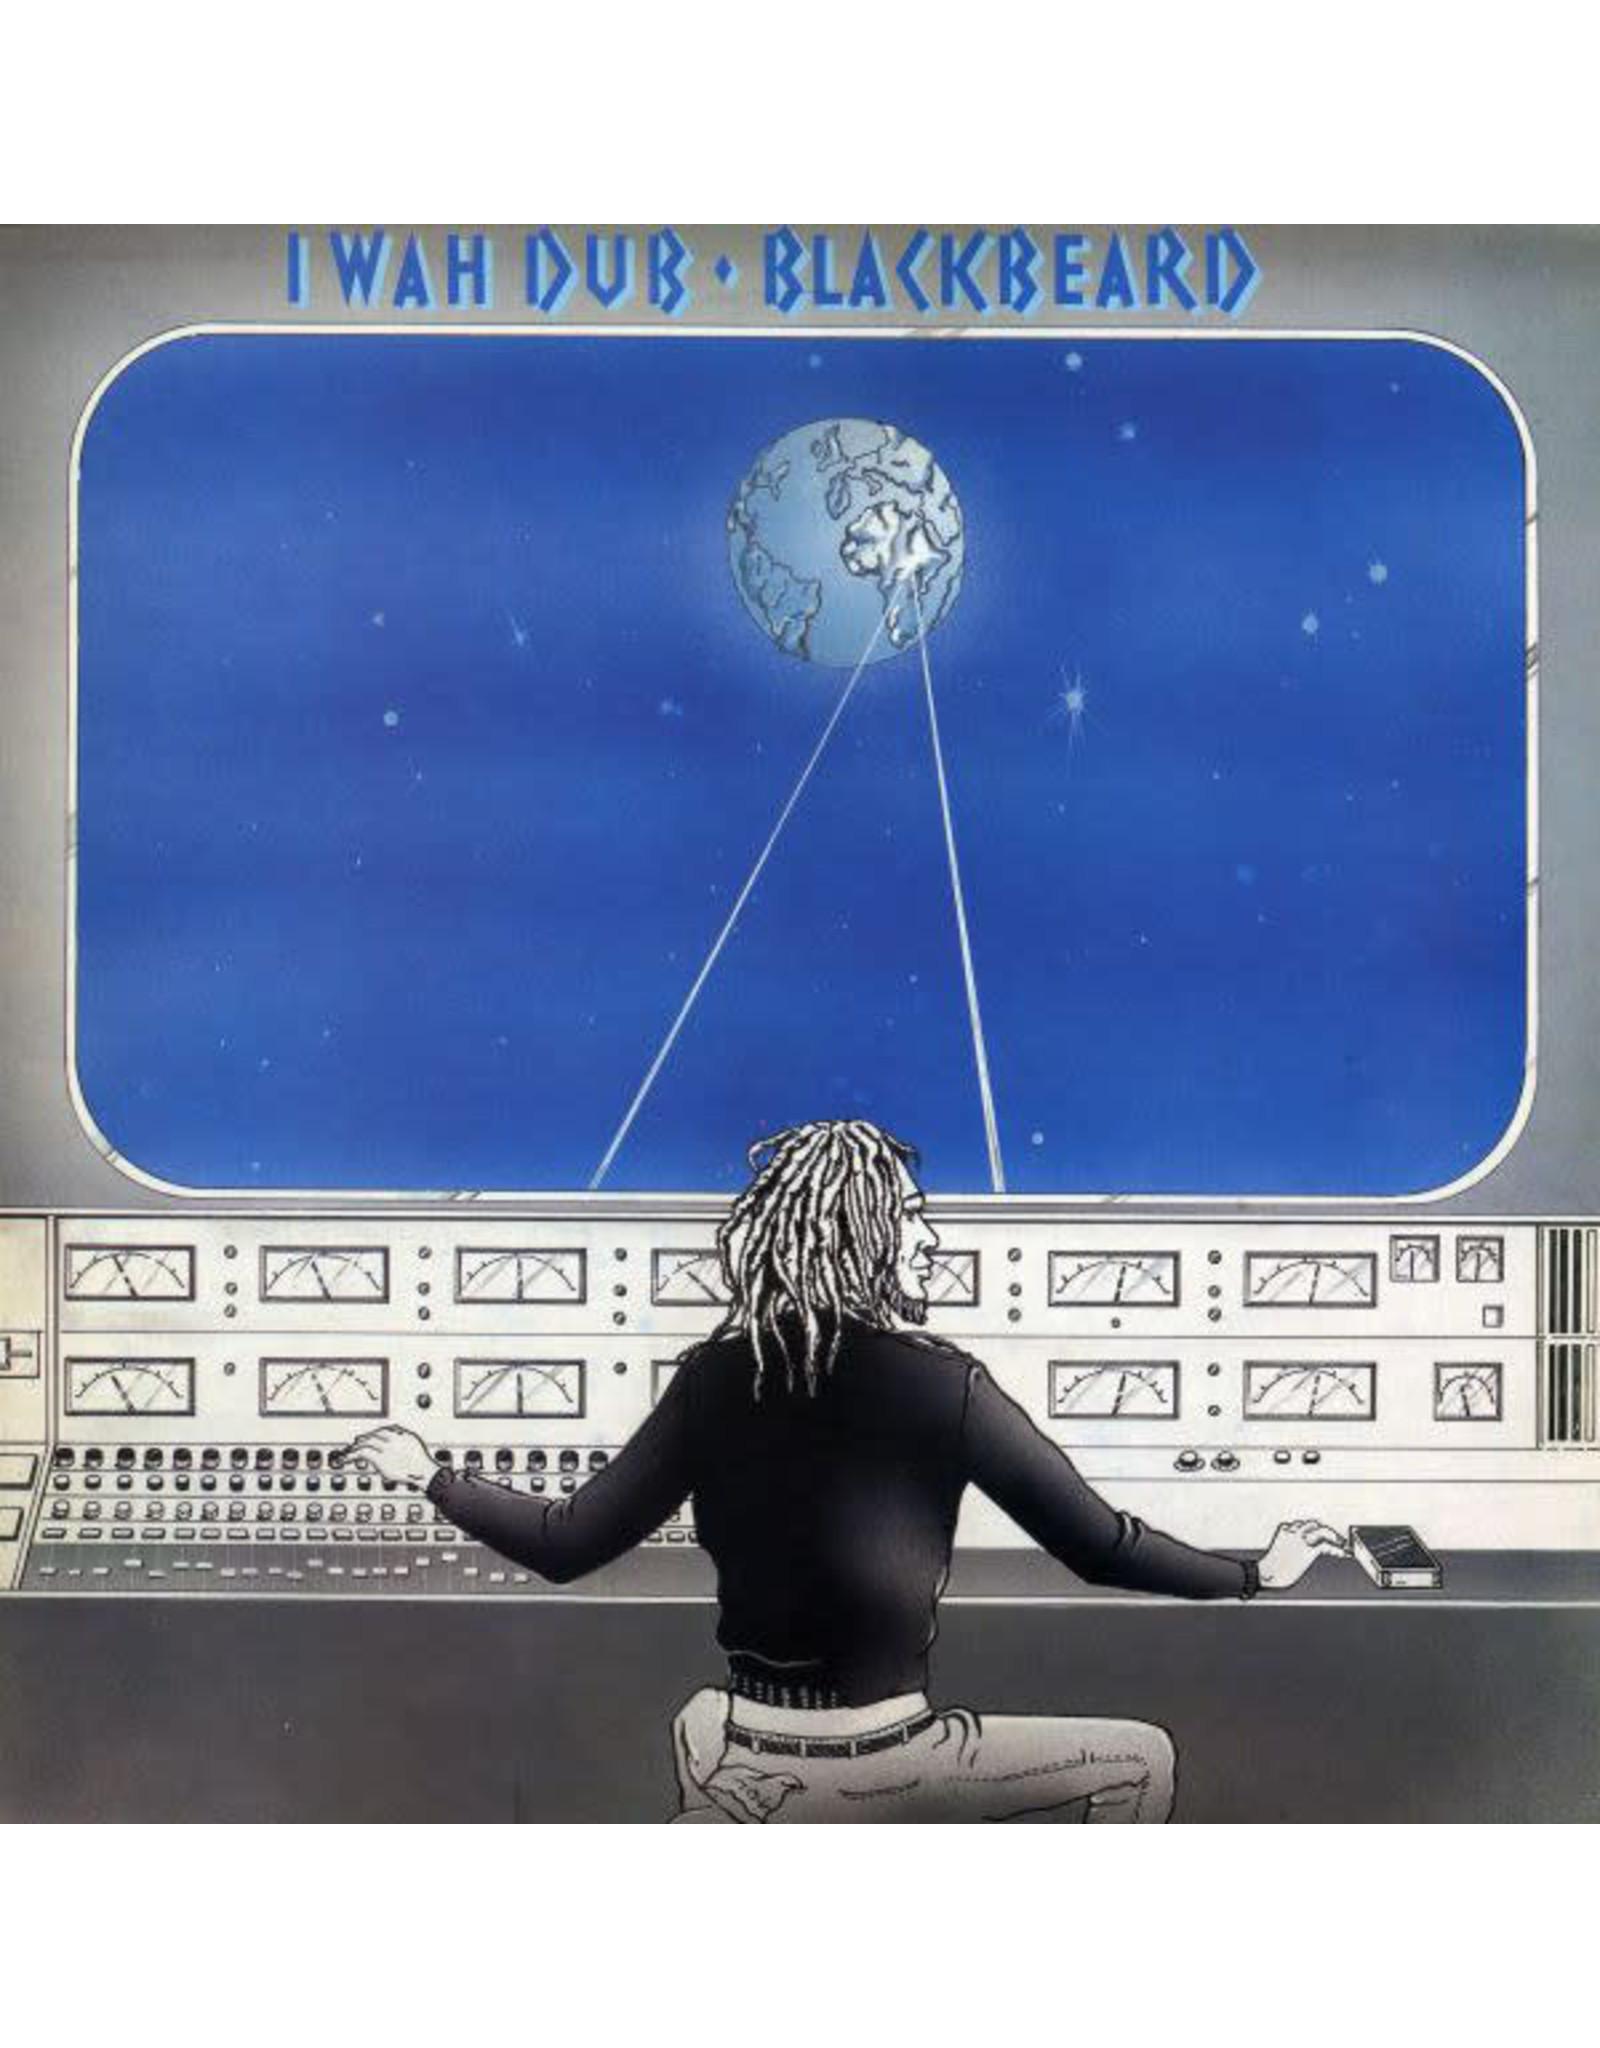 Blackbeard - I Wah Dub LP (RSD '21 Exclusive)